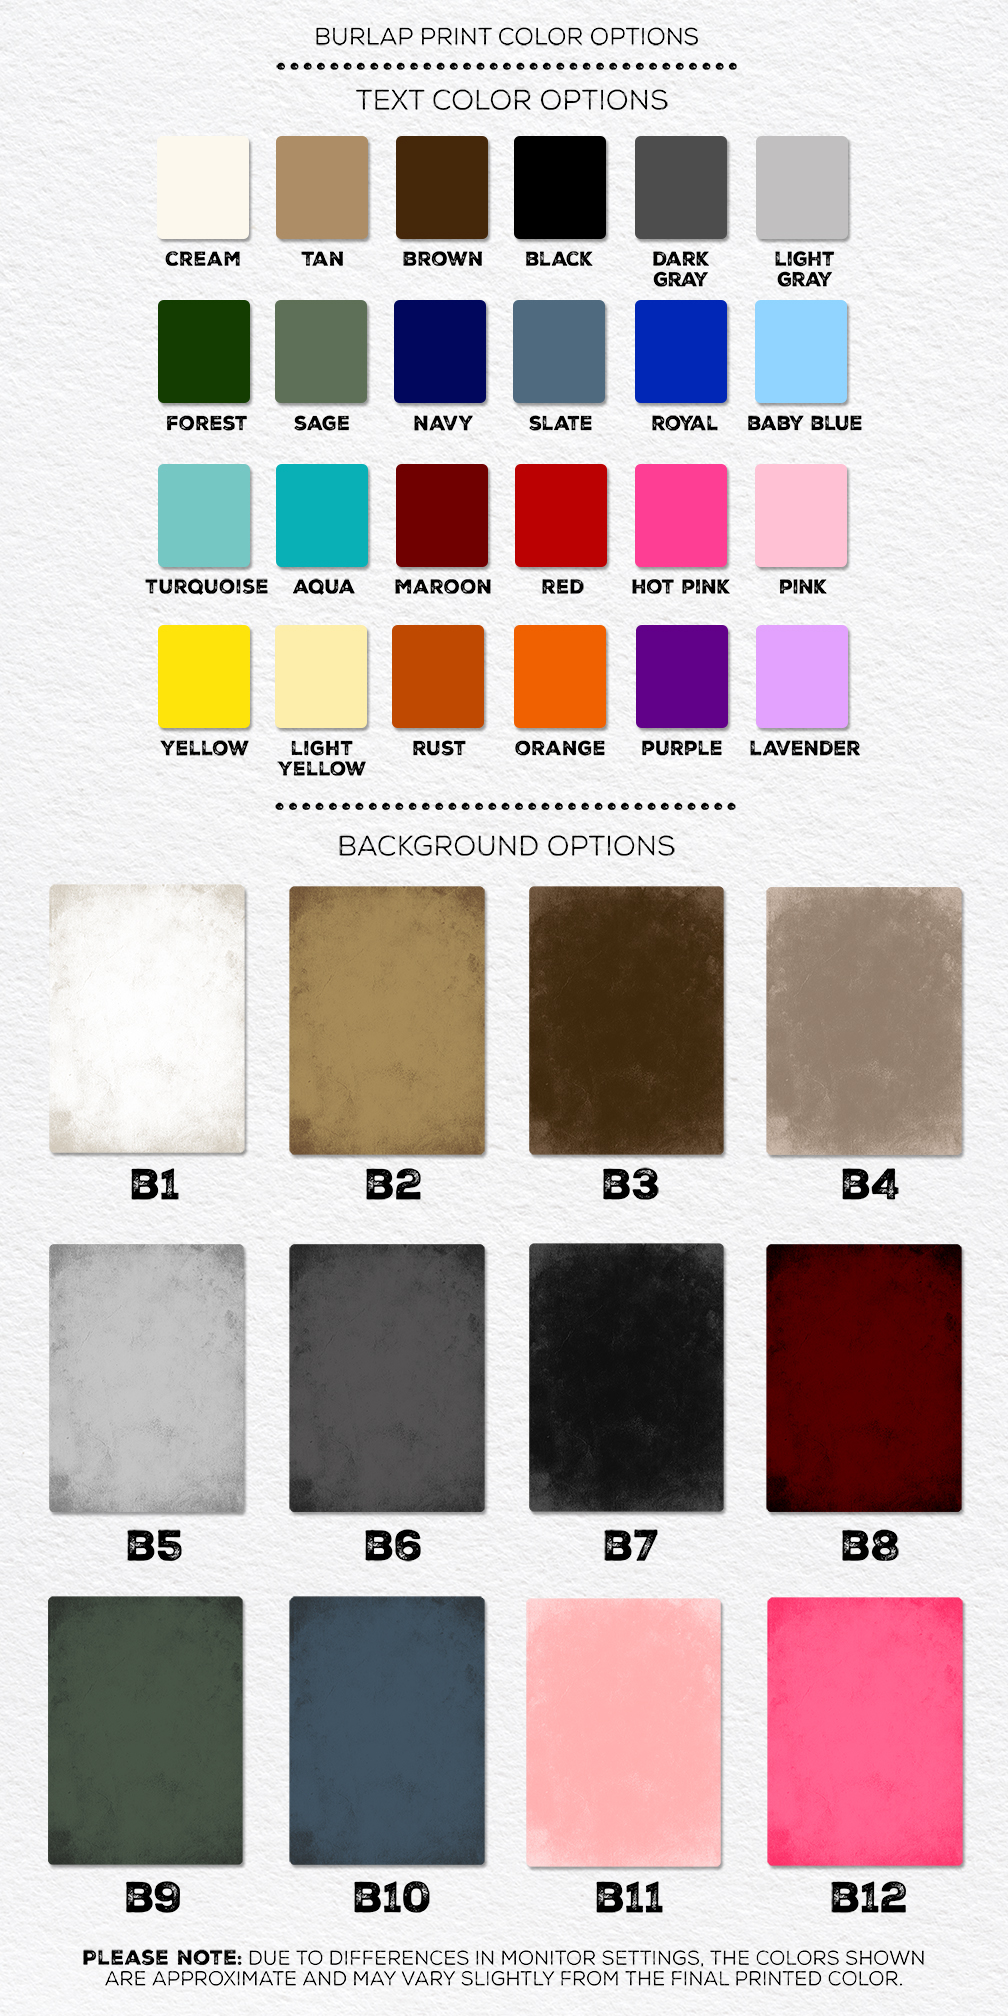 Personalized Burlap Sign Color Options